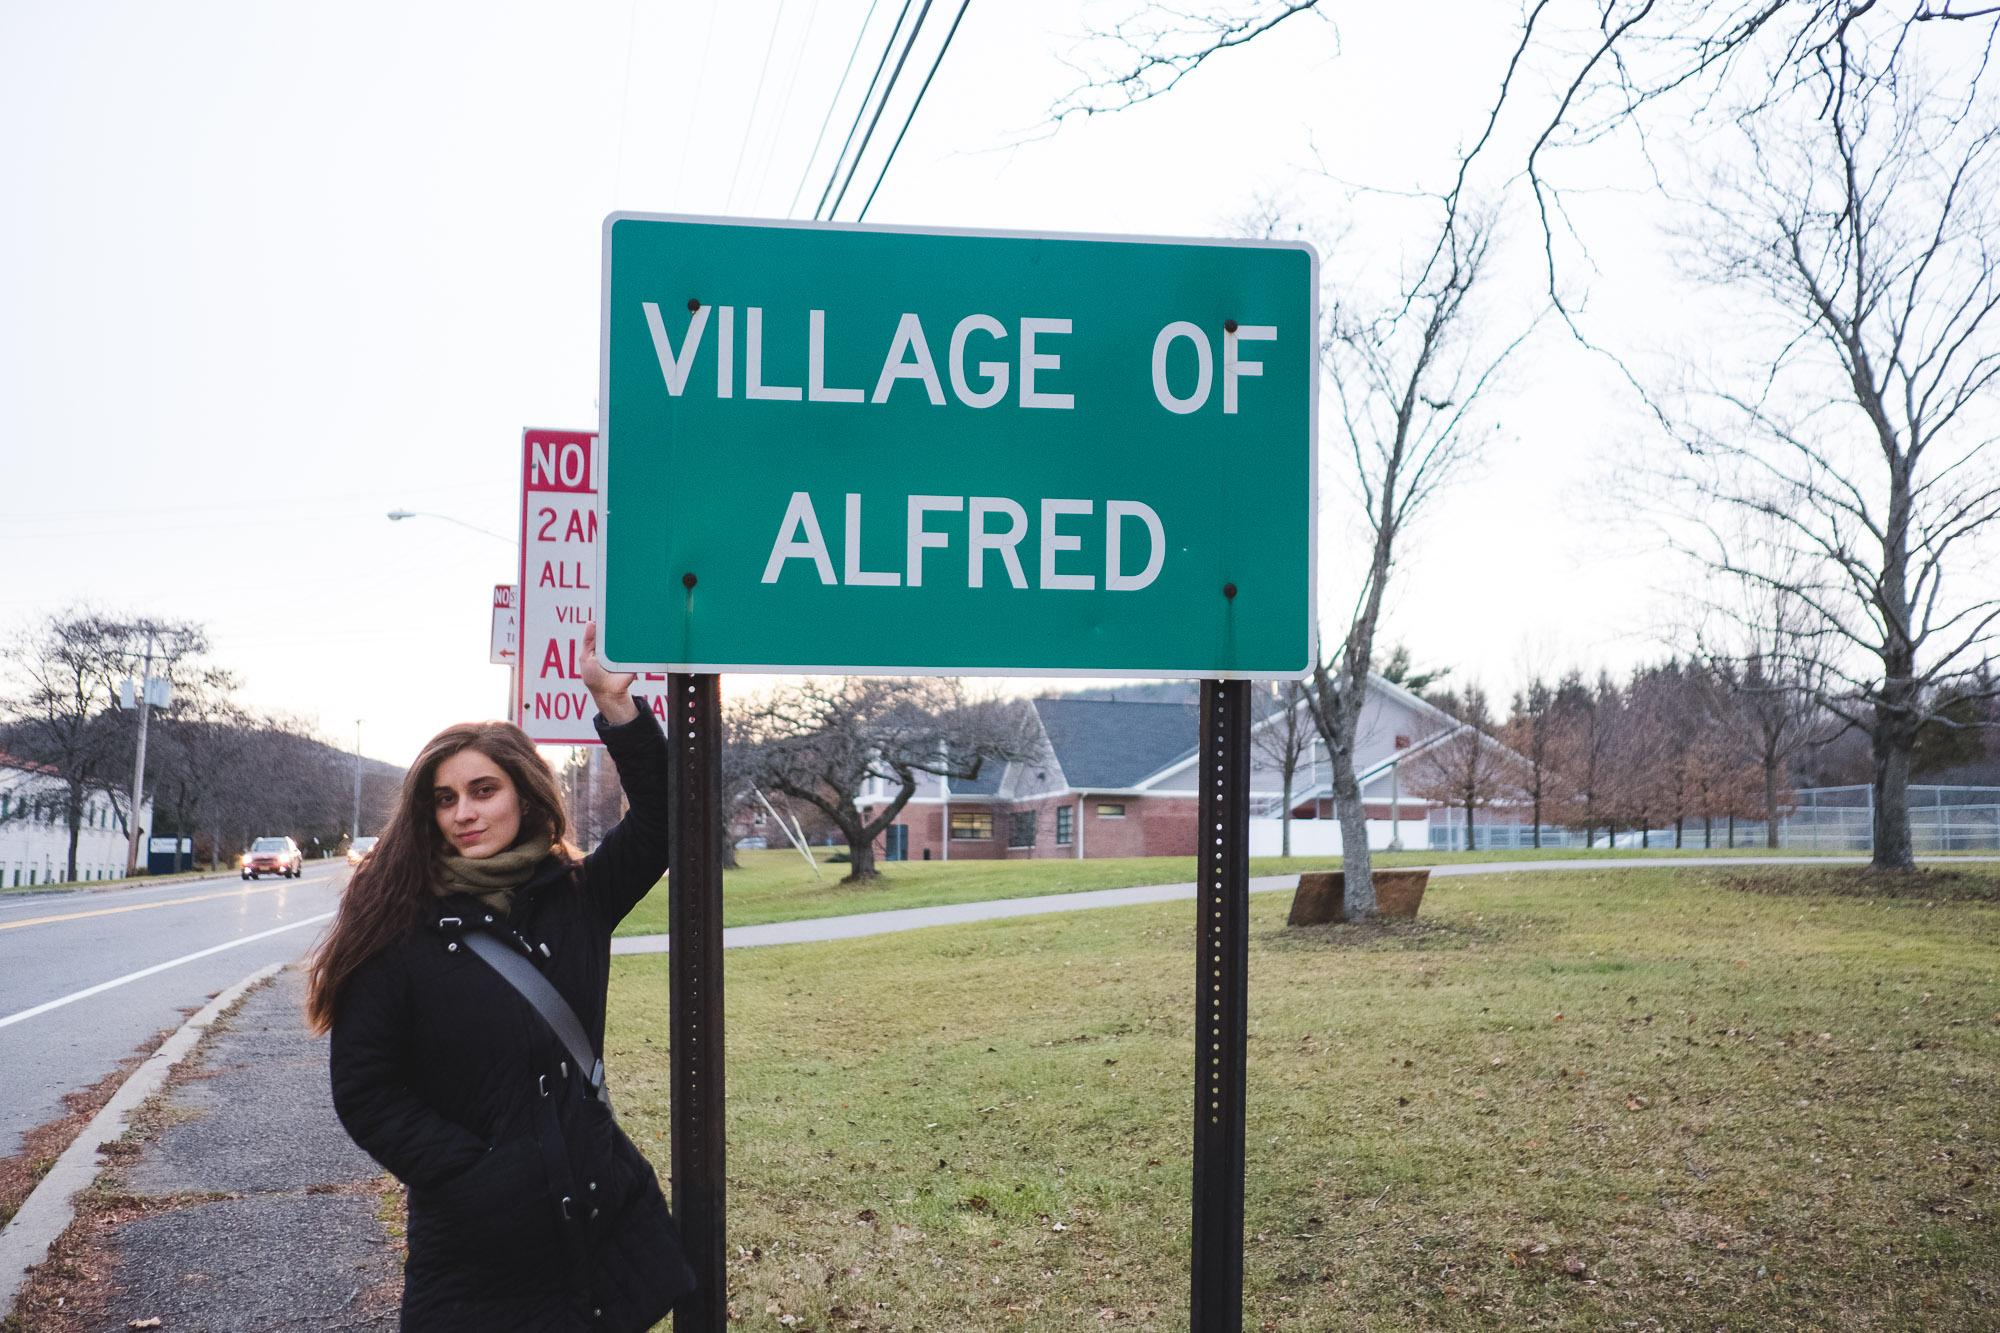 village-of-alfred-sign